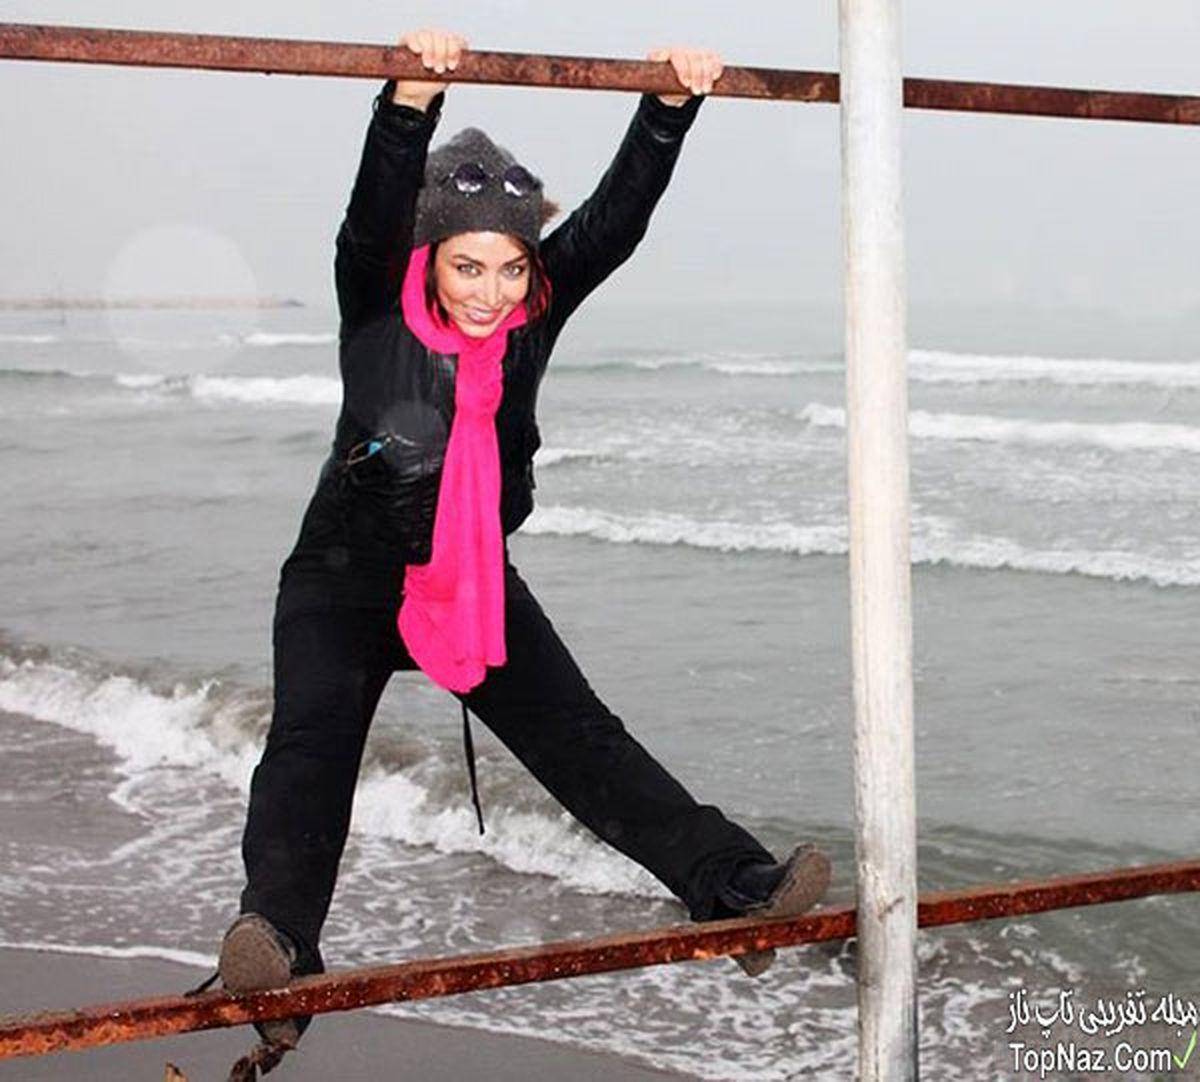 ژست عجیب و غریب فقیه سلطانی کنار دریا + عکس